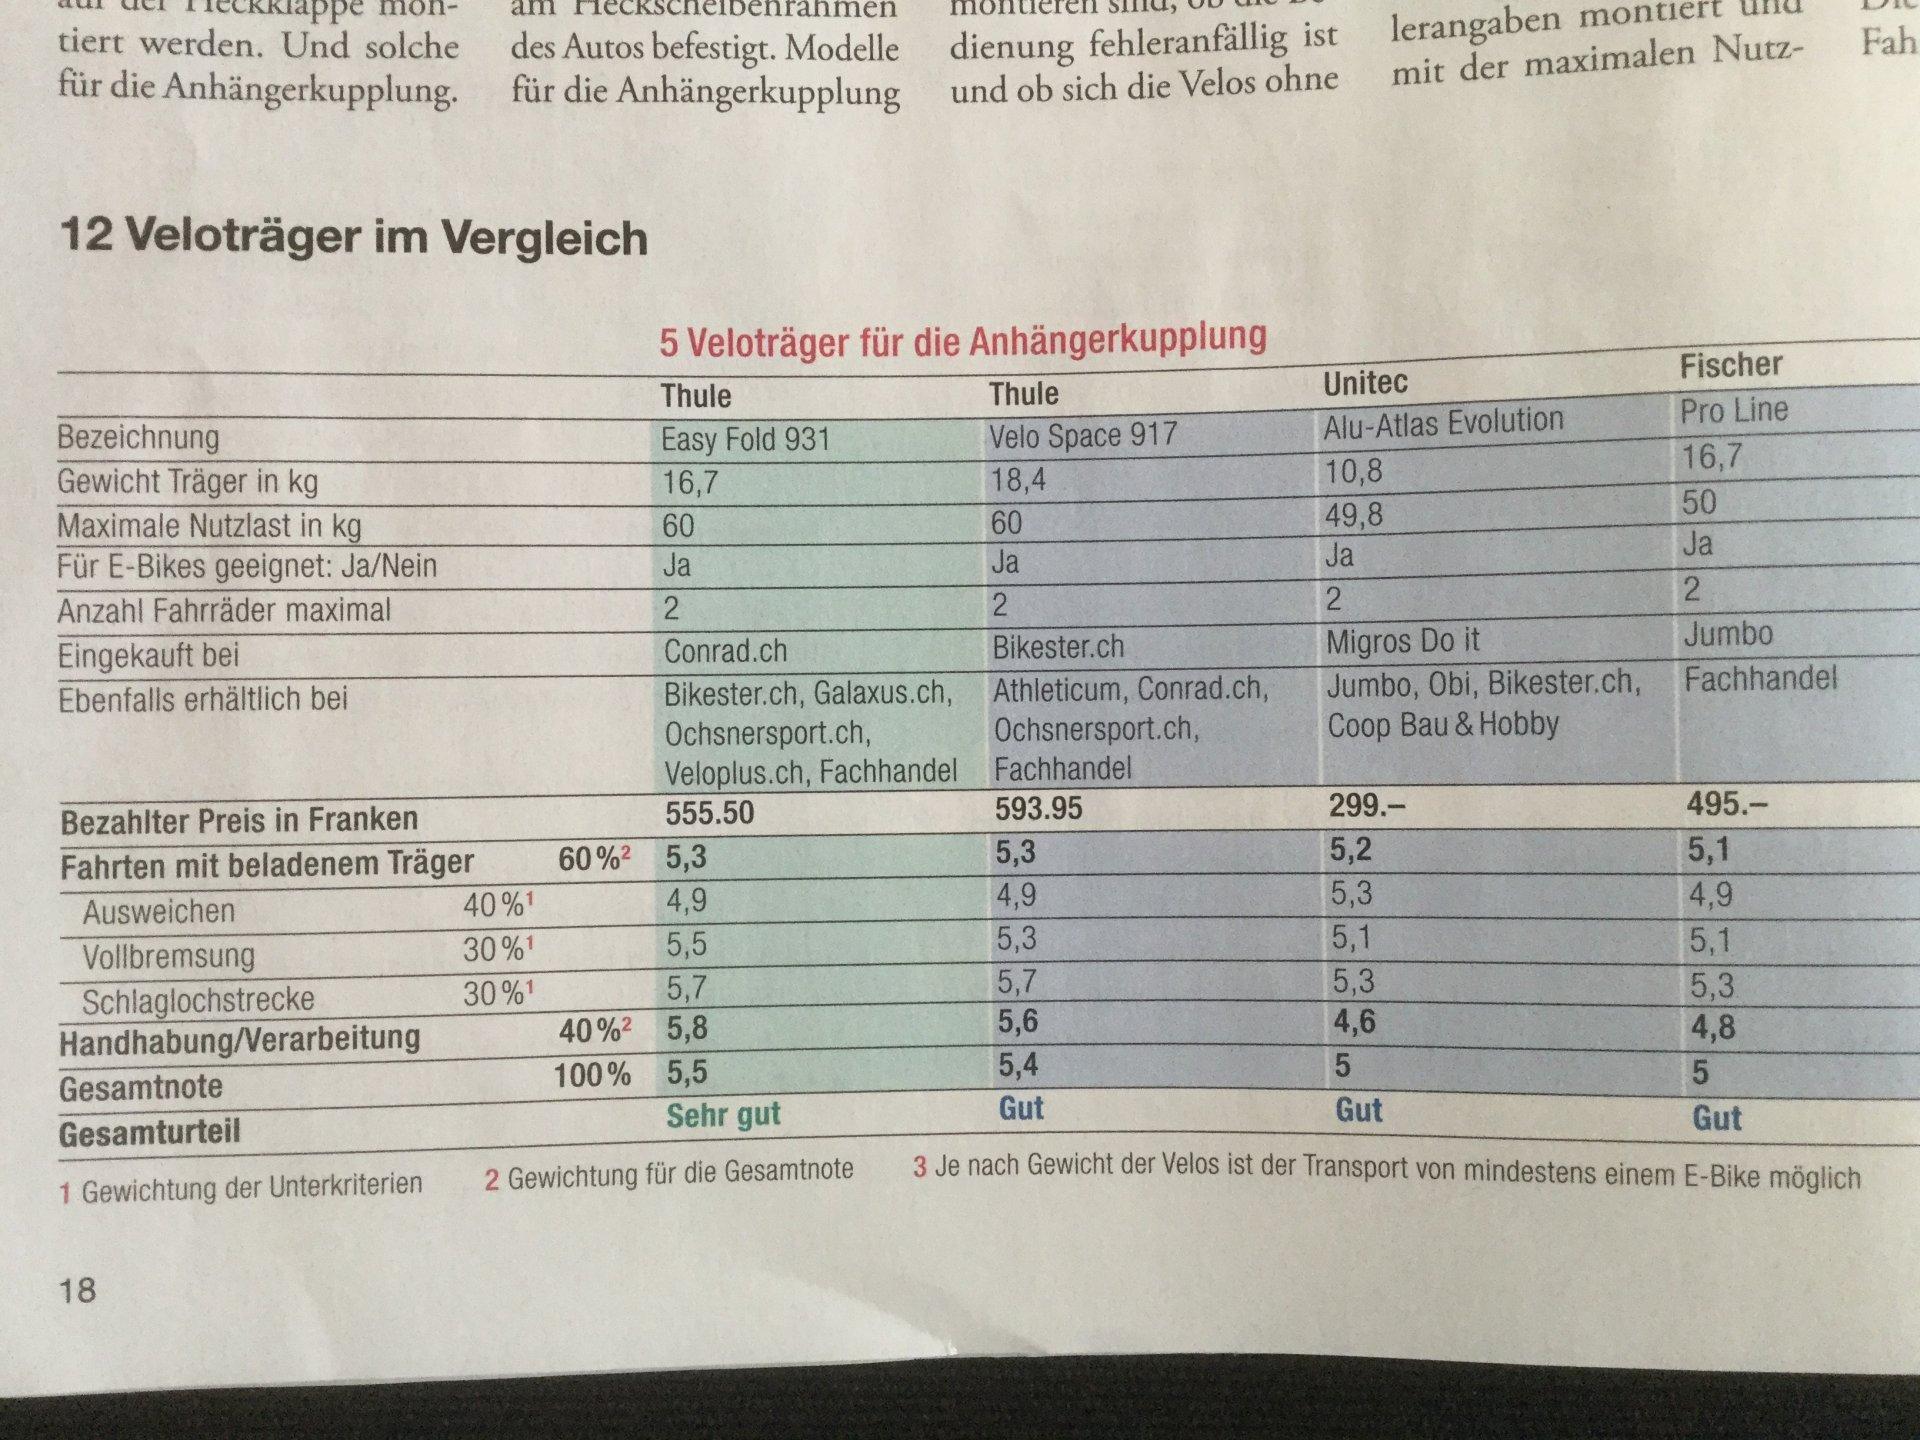 Ktipp_VelotraegerAHK.jpg